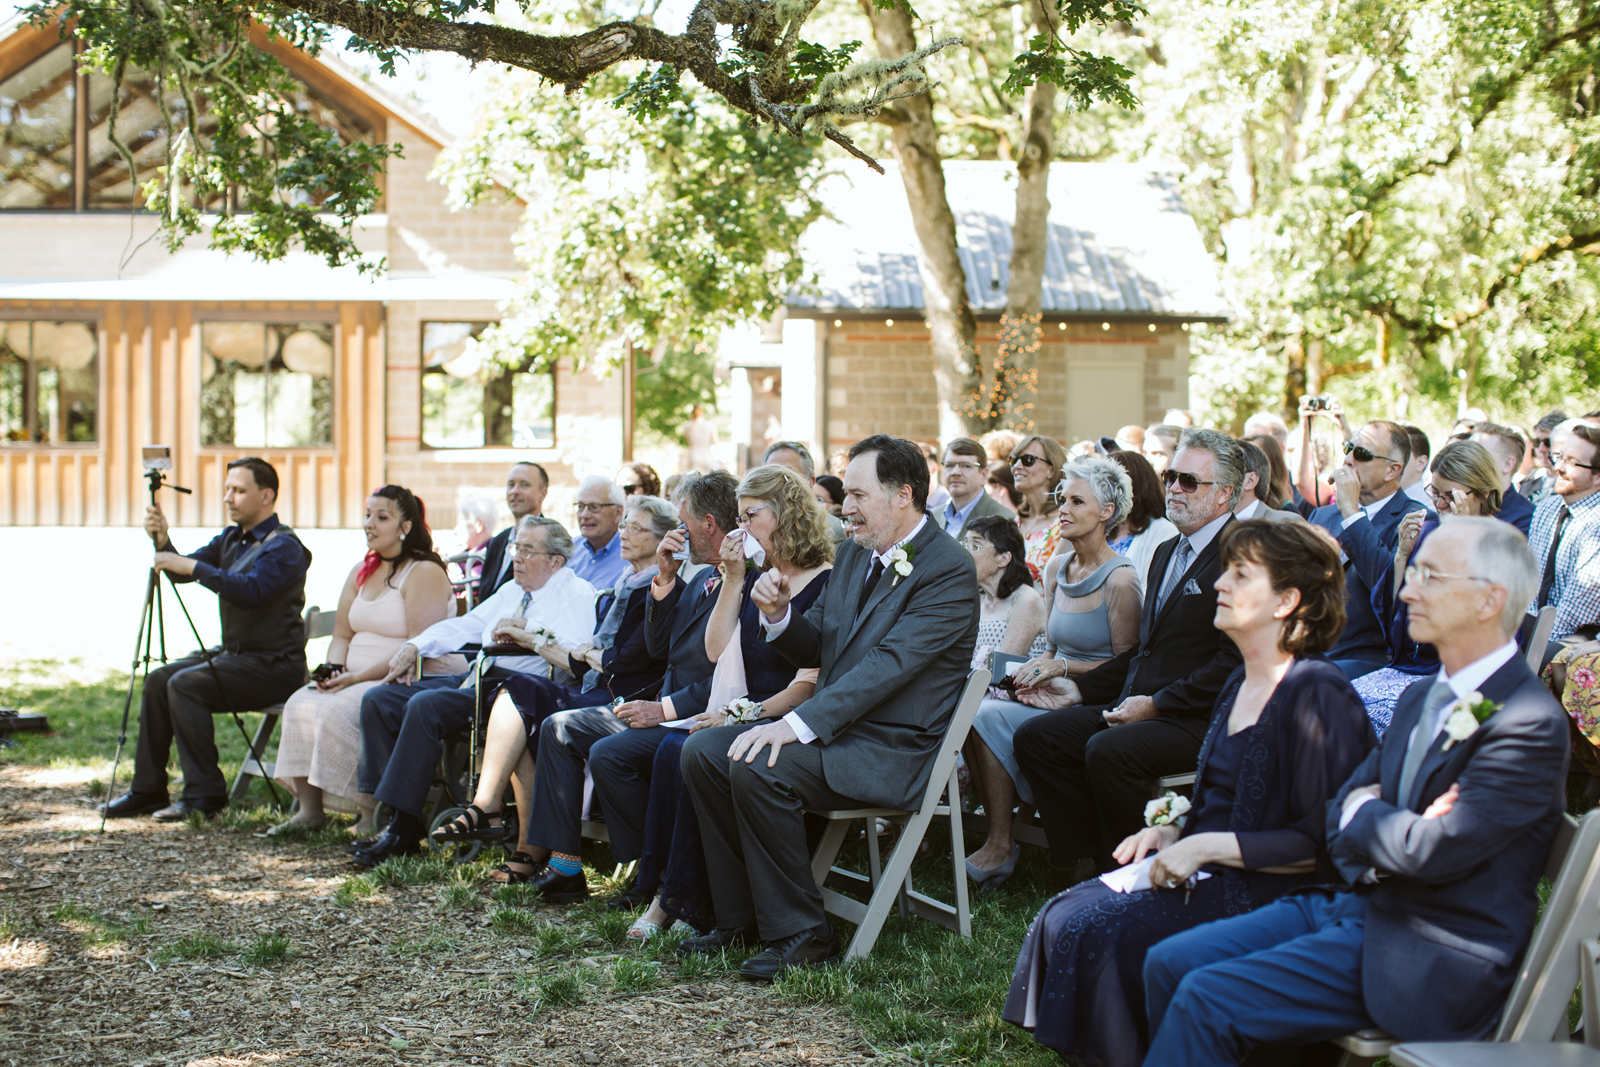 046-daronjackson-rachel-michael-wedding-mtpisgah.jpg